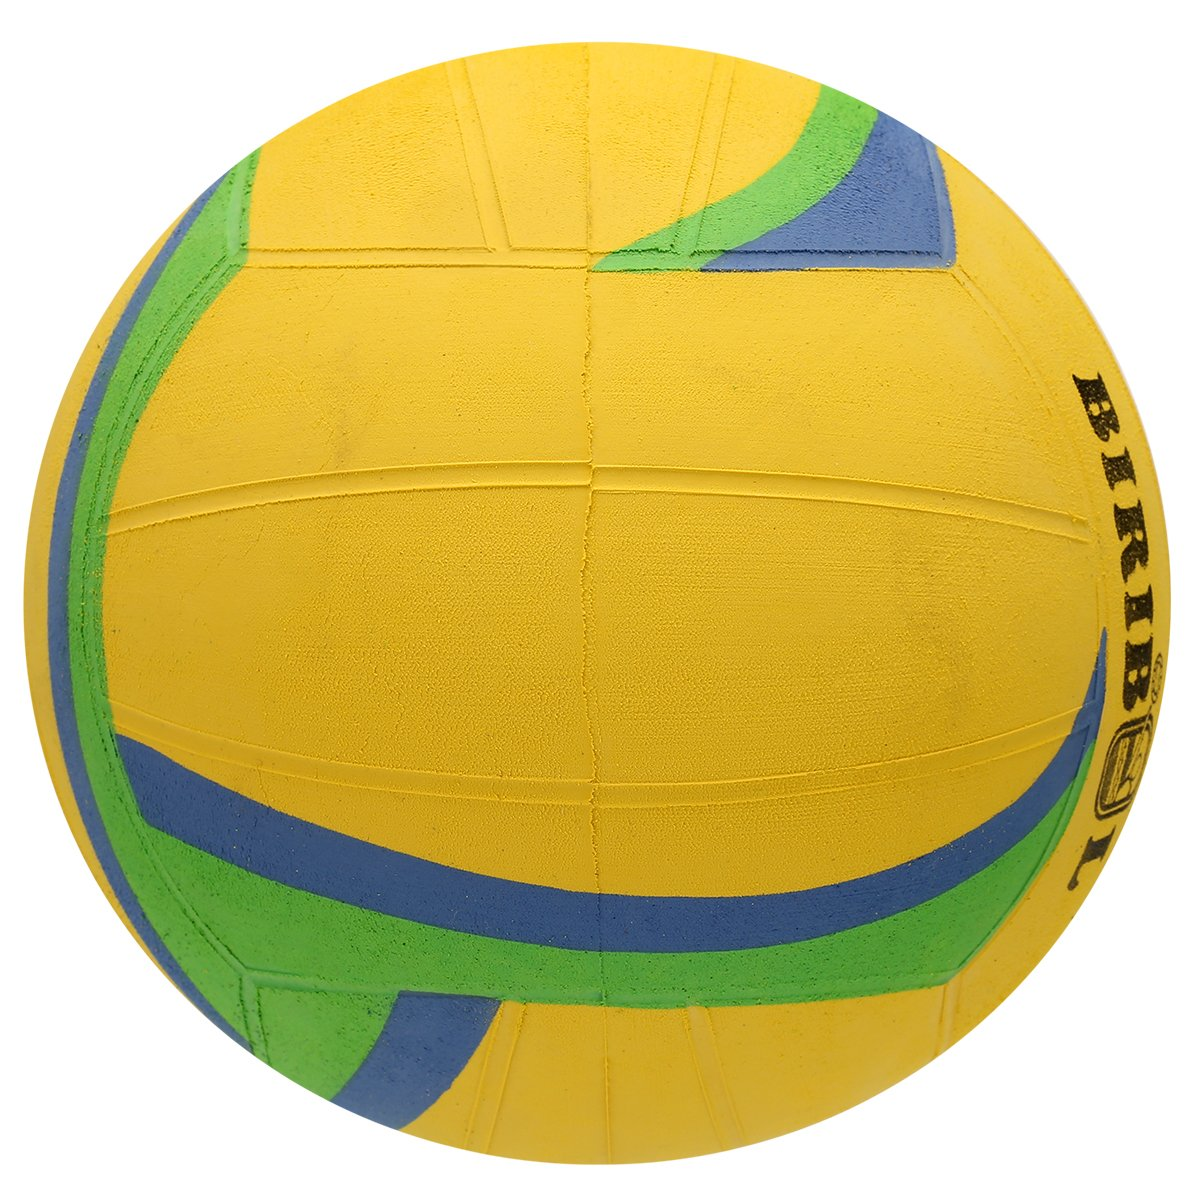 3aac1e6f3c Bola Penalty Biribol 5  Bola Penalty Biribol 5